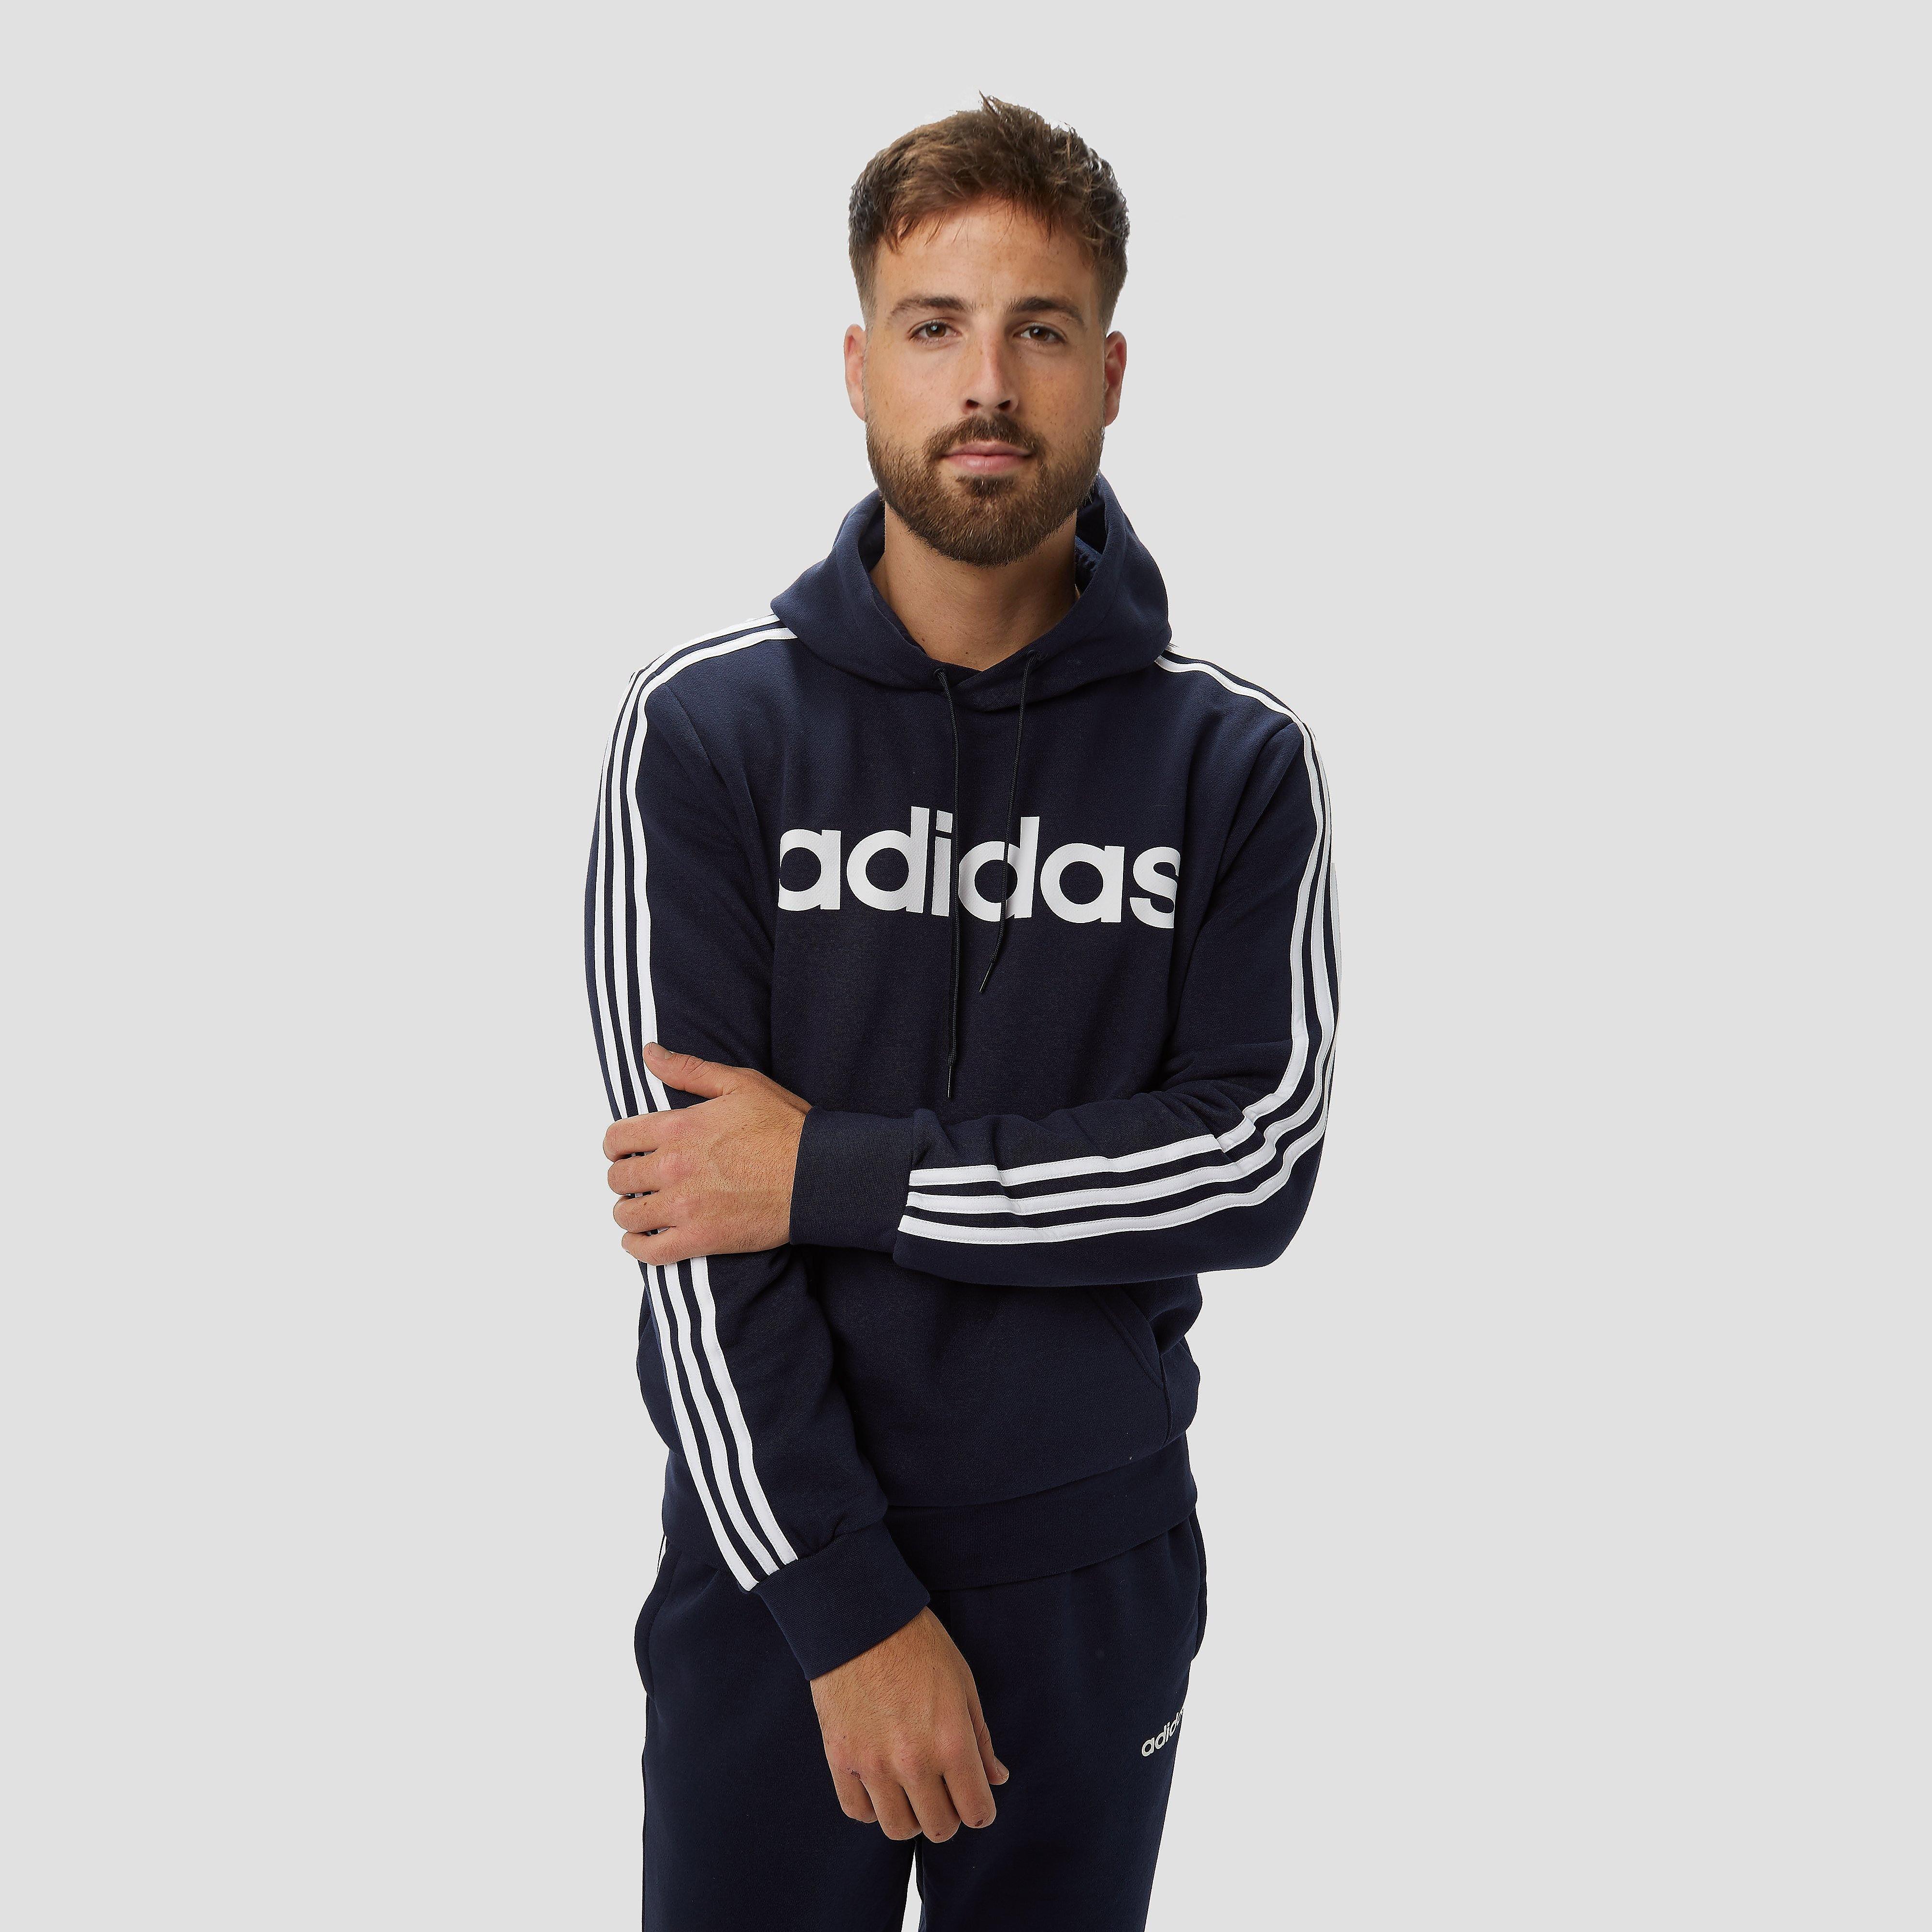 Adidas Online adidas Essentials 3 stripes fleece trui